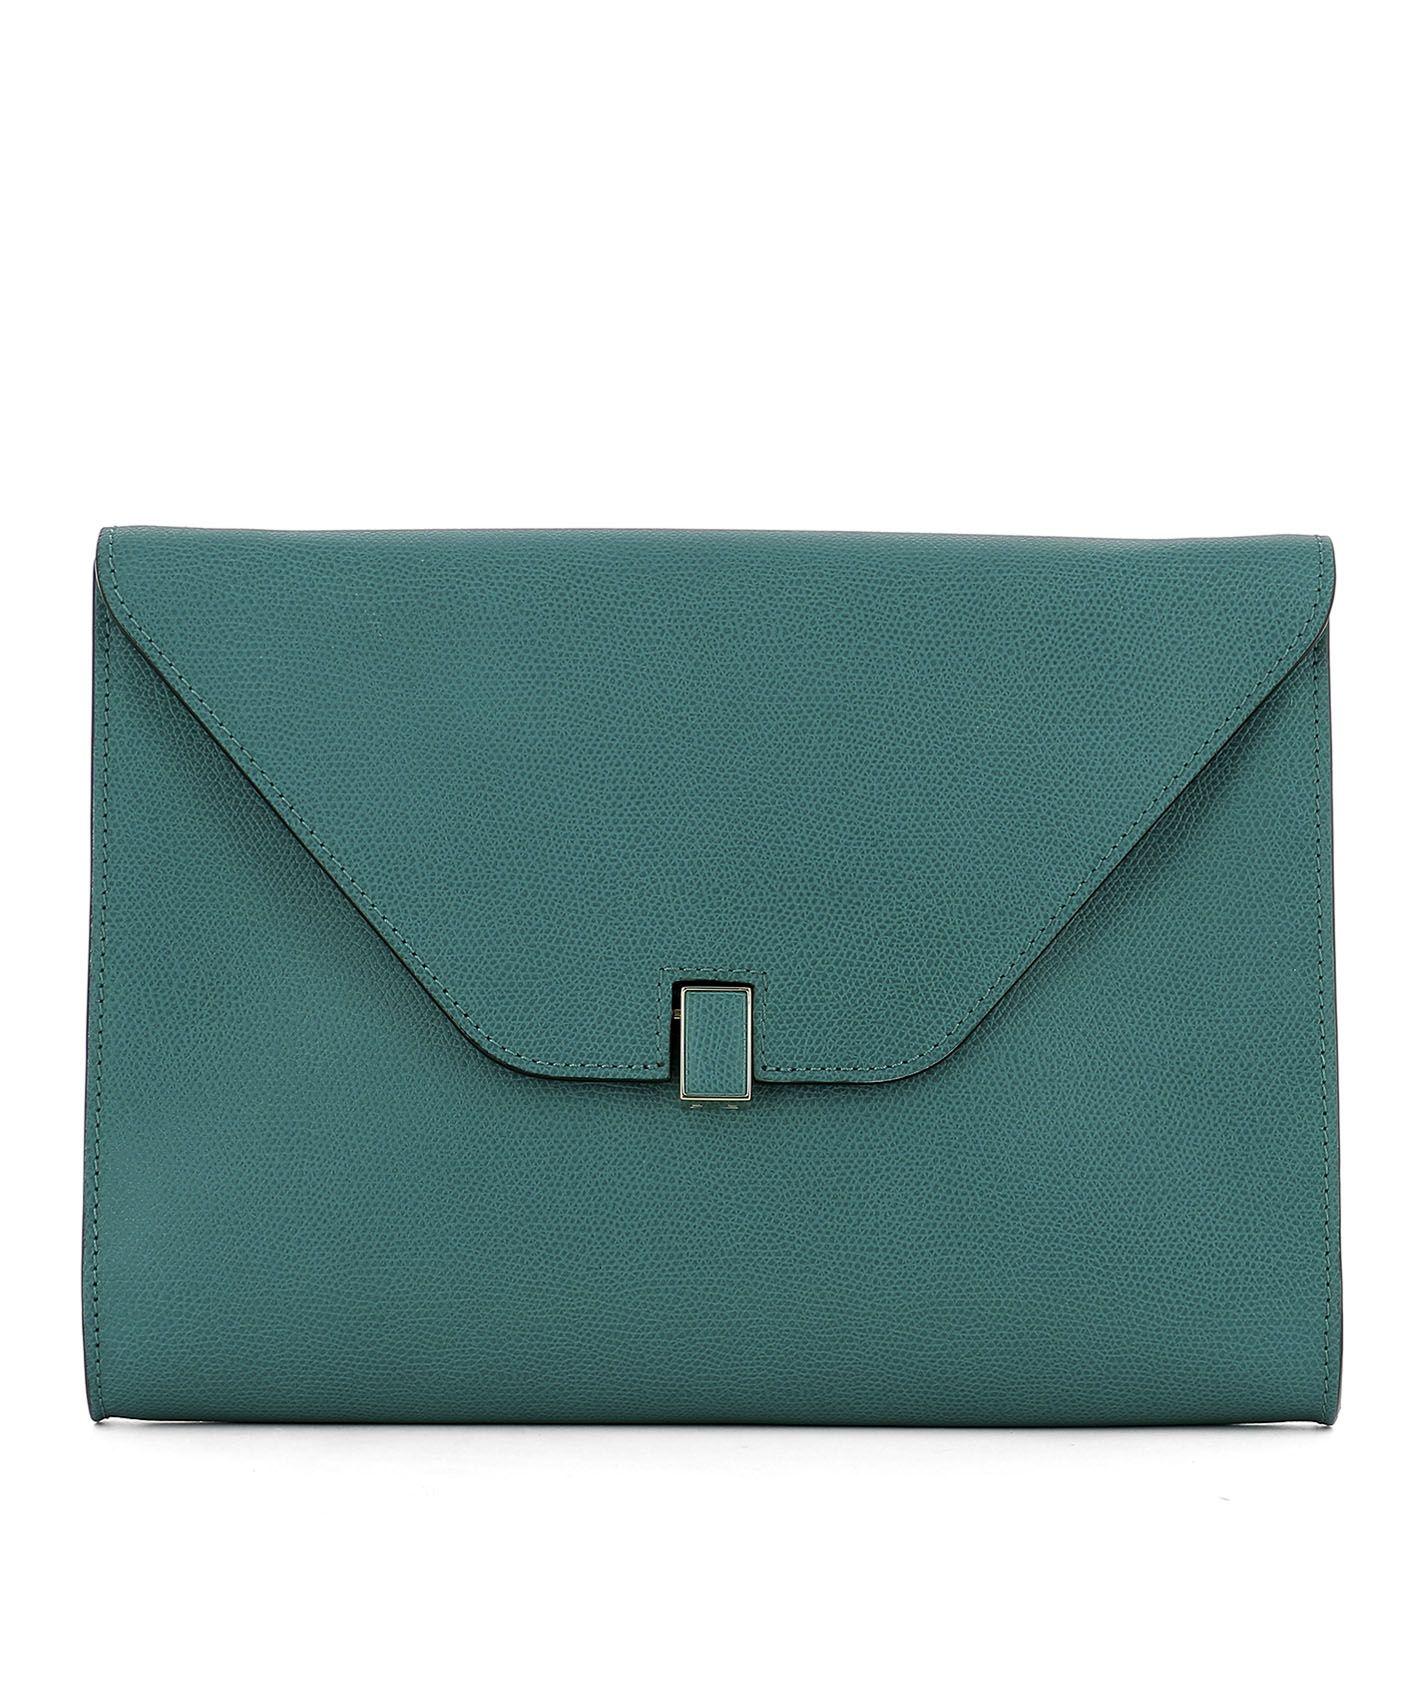 Green Leather Pochette